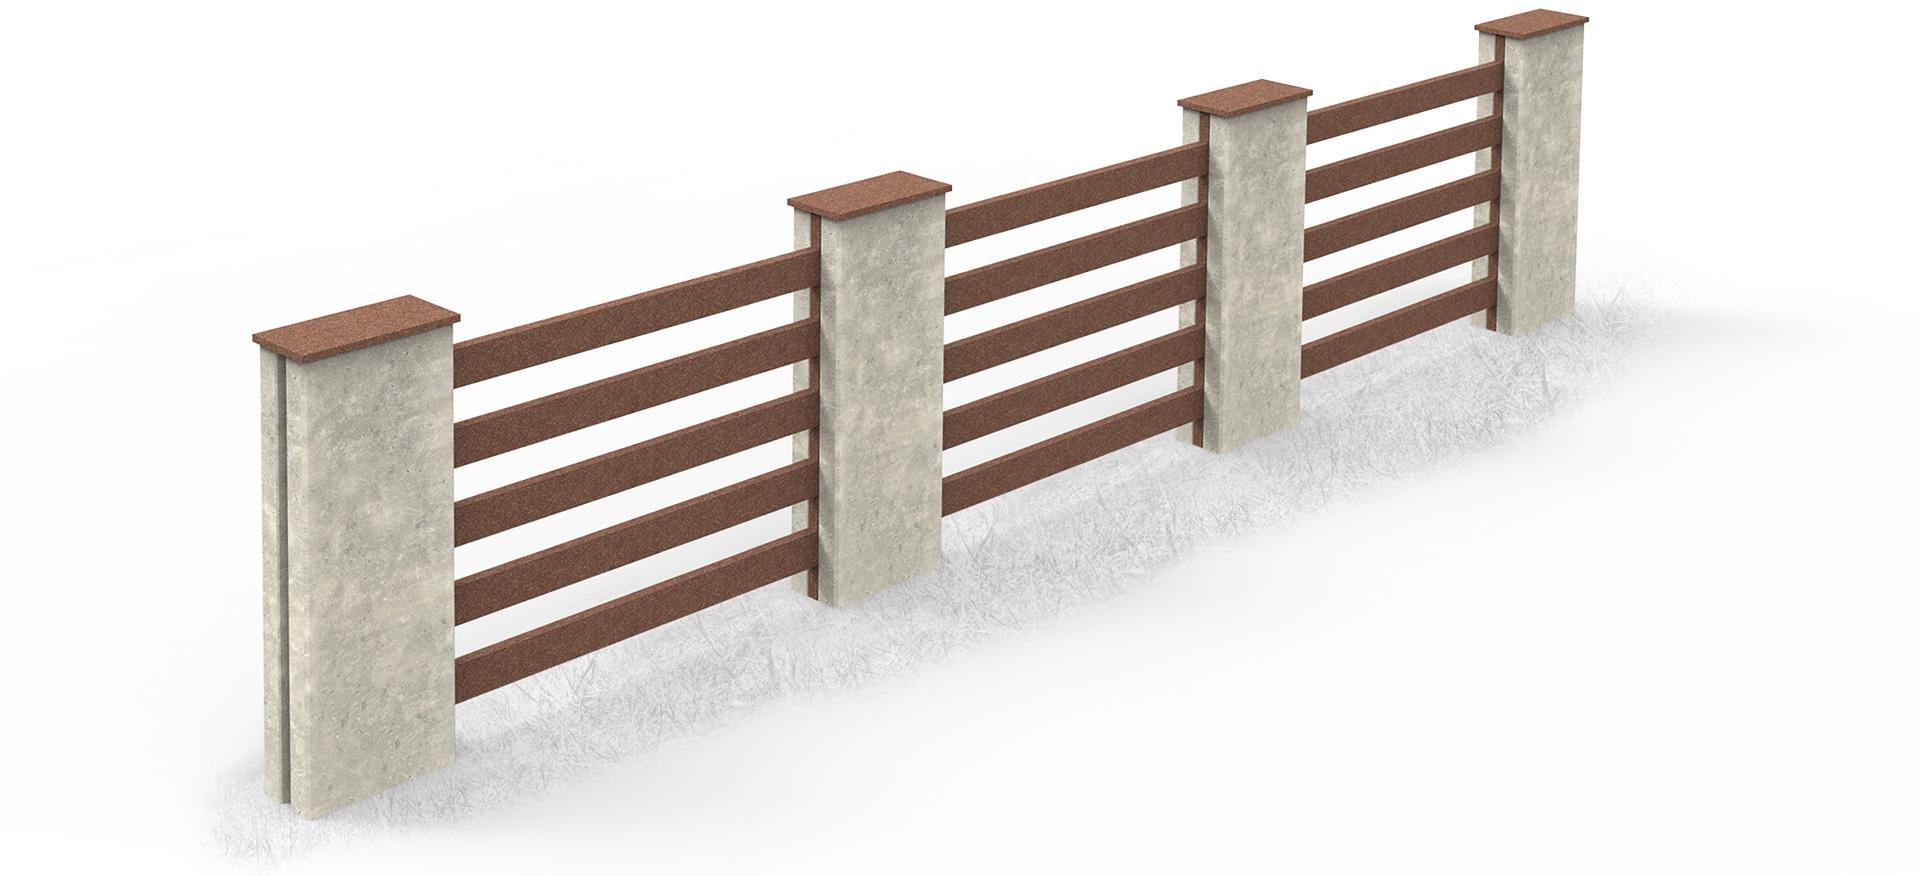 Berühmt megawood Terrassensystem - Gartenbank RG97